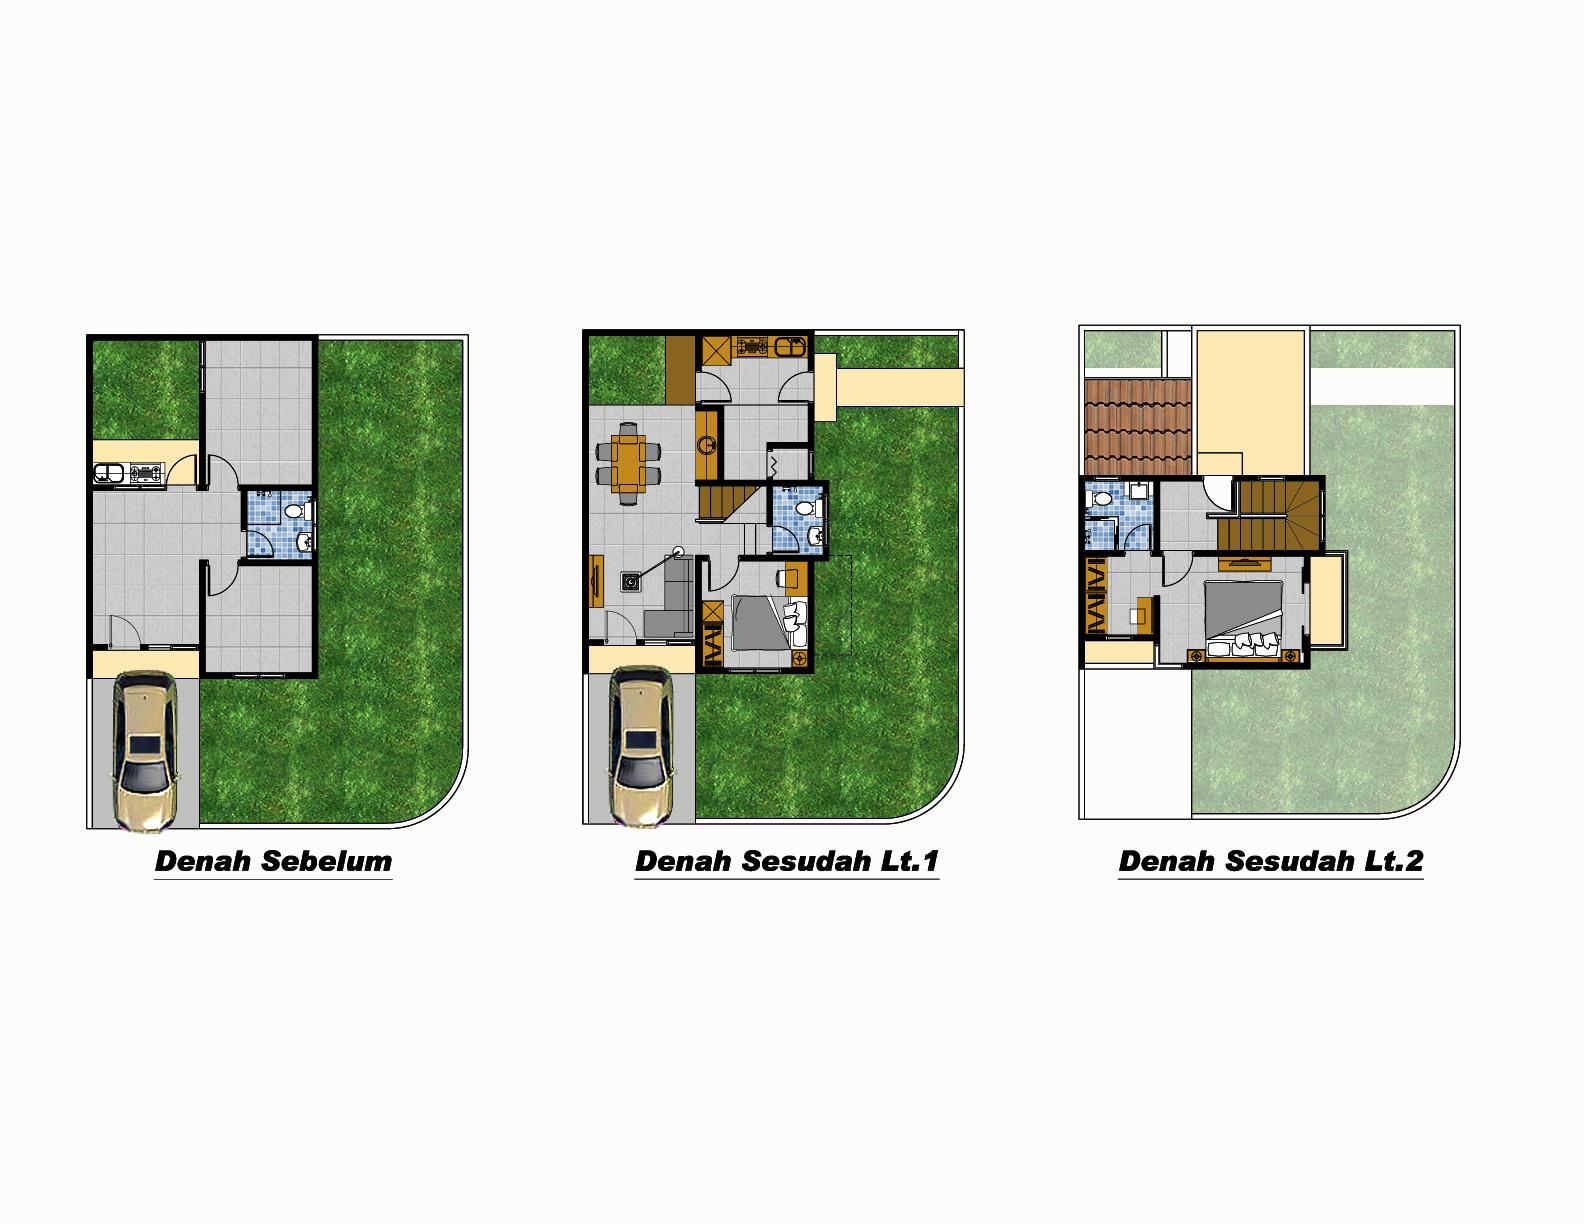 ... 40 desain rumah minimalis type interior Renovasiku 36 Renovasi Rumah 1 Type newhairstylesformen2014 Design ...